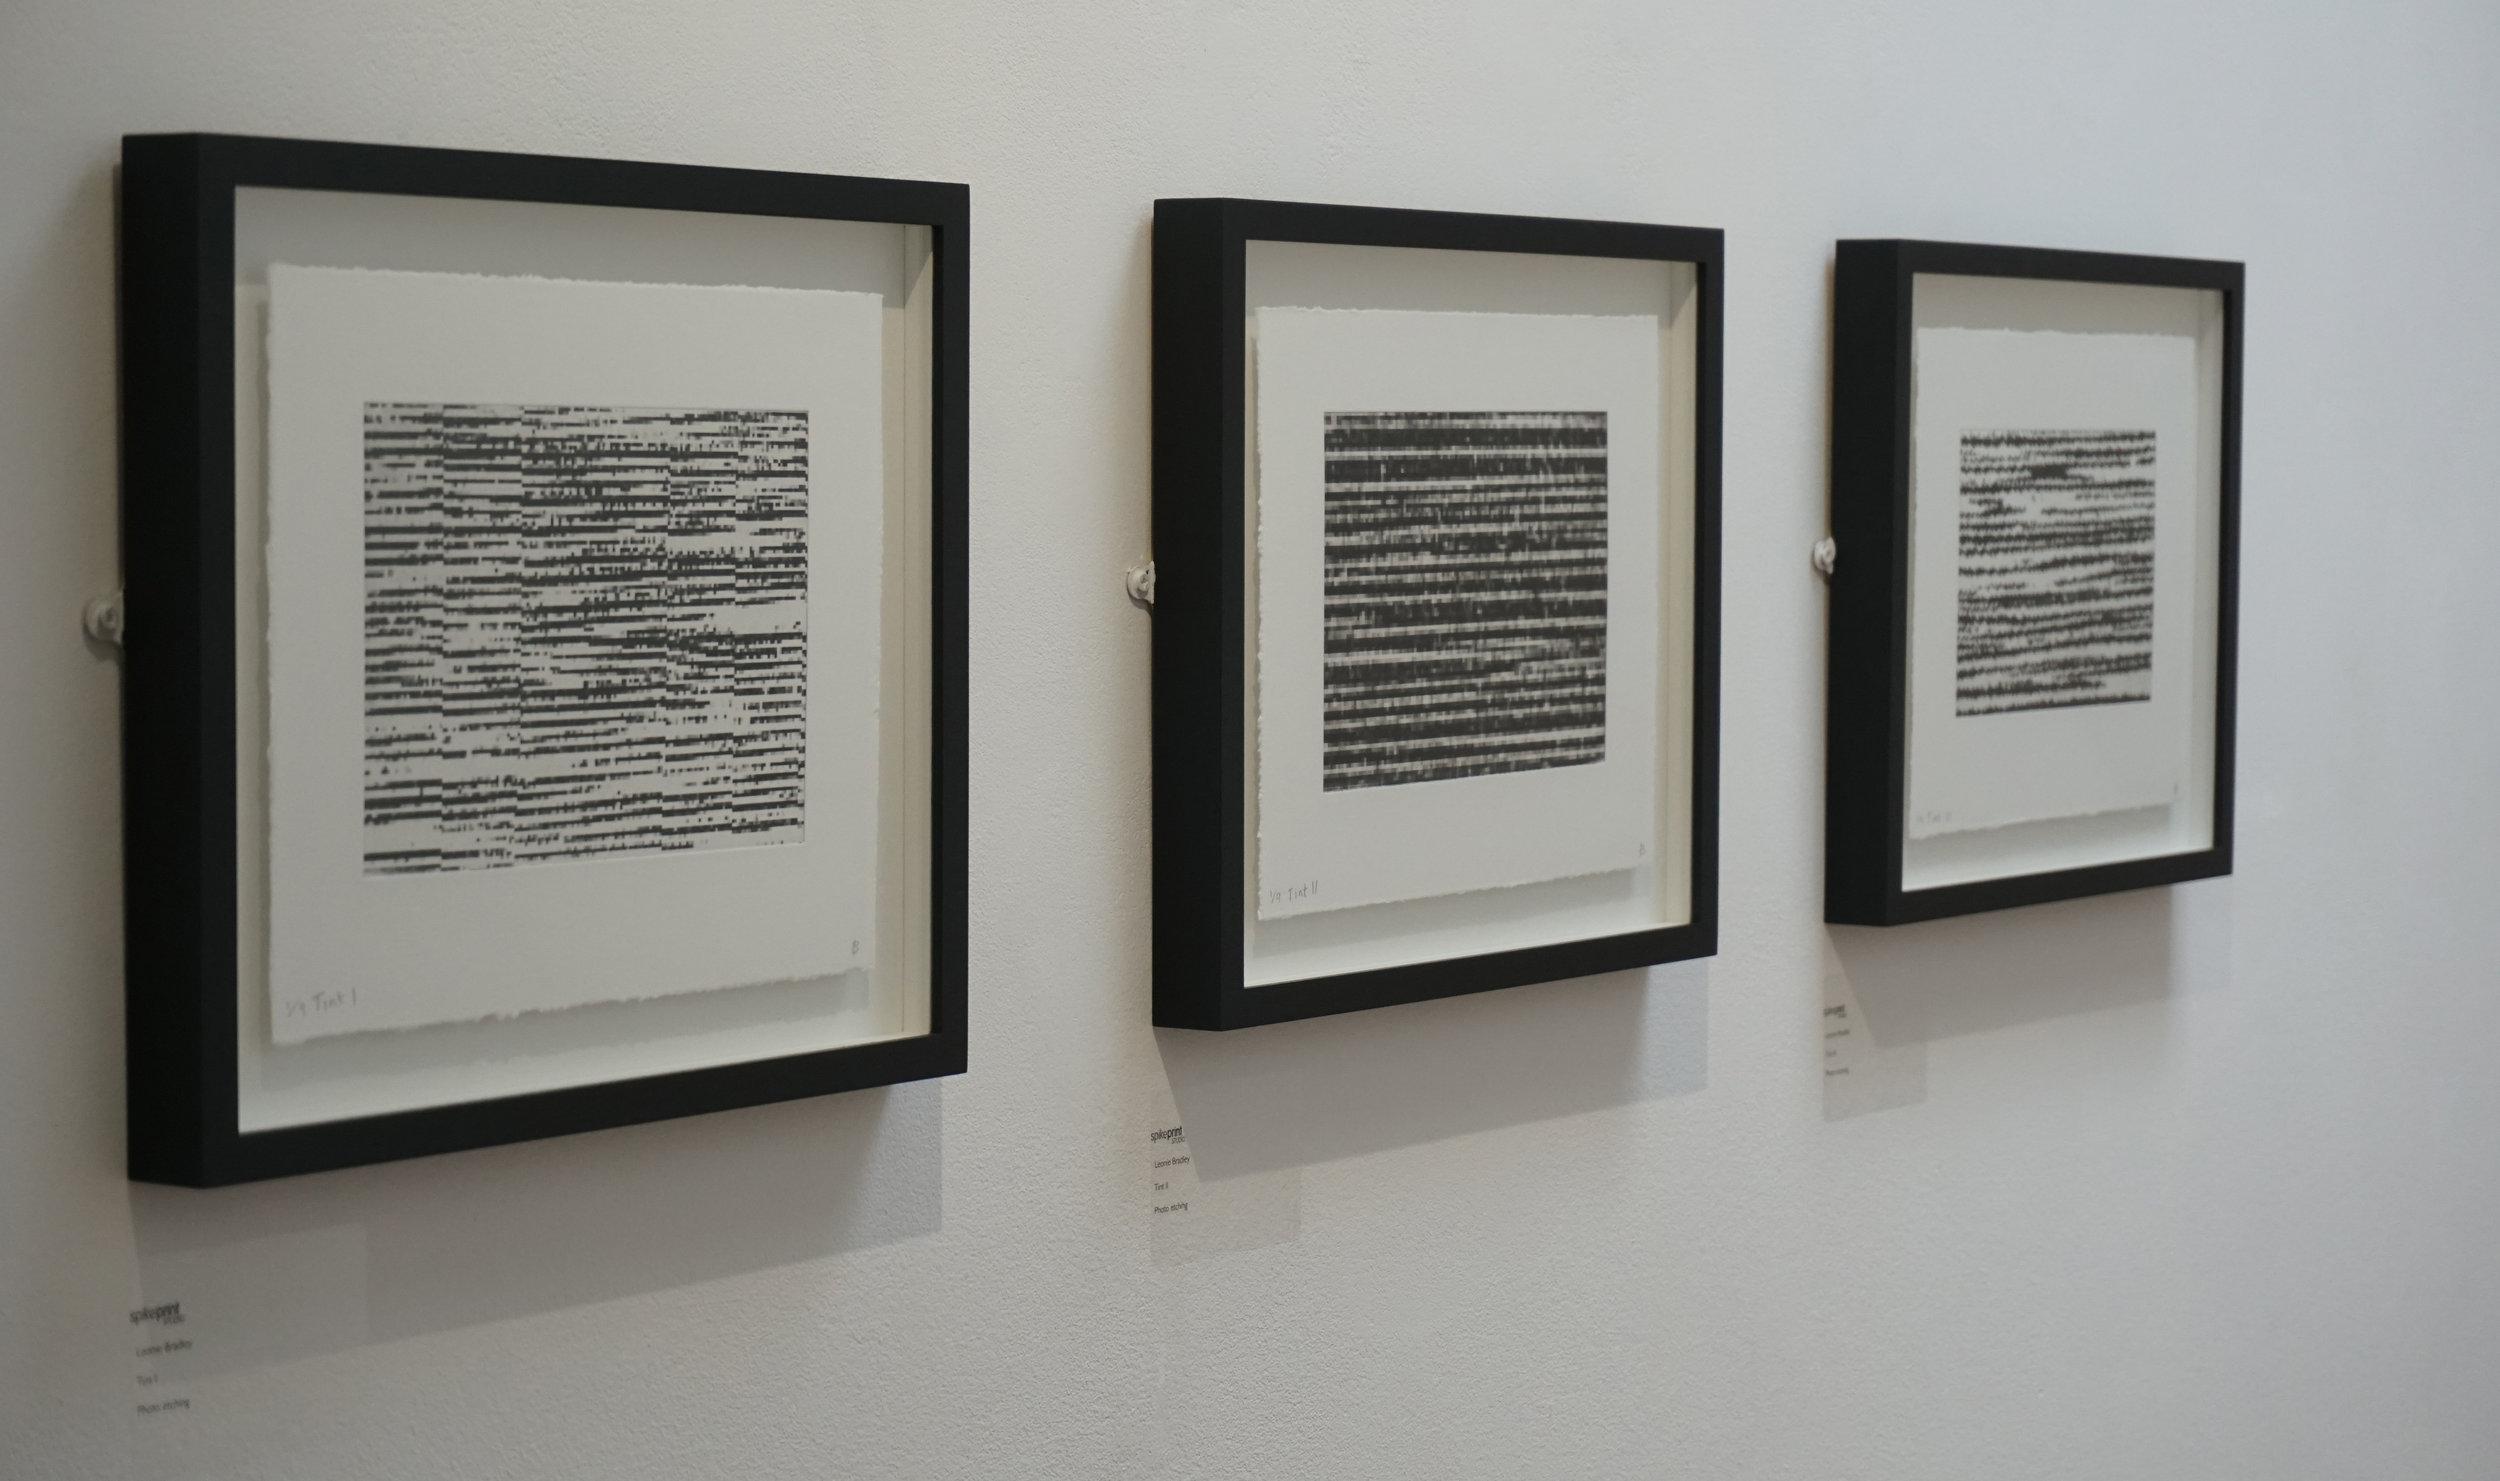 Tint I, II & III installation view